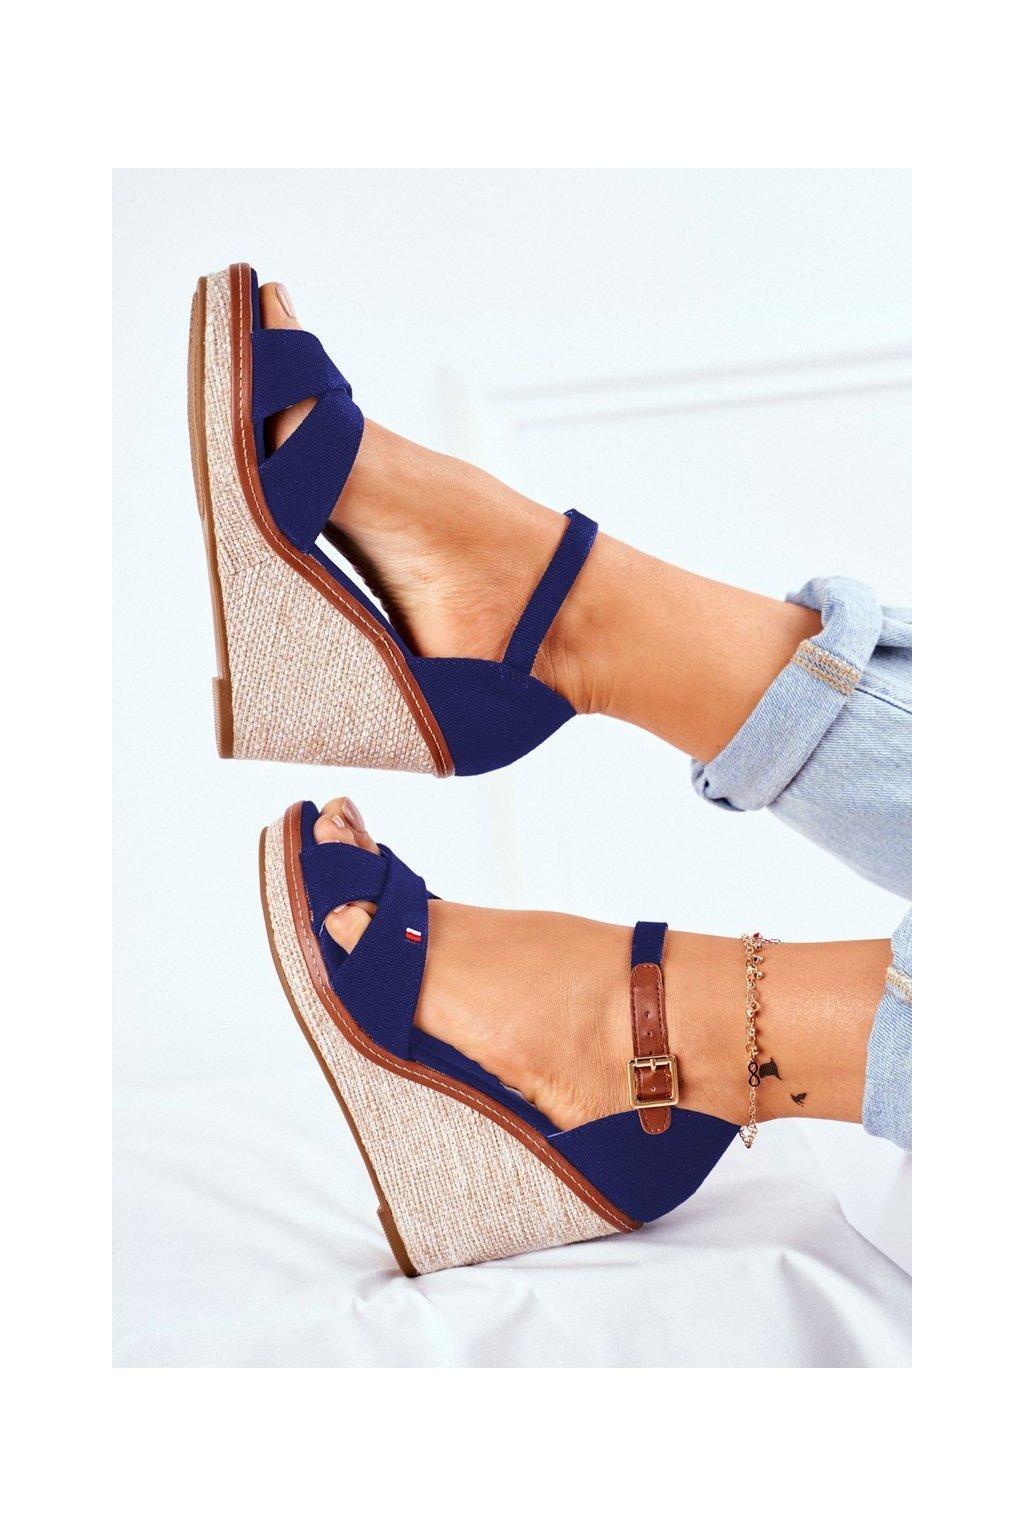 Dámske sandále na platforme farba modrá NJSK R133P BLUE